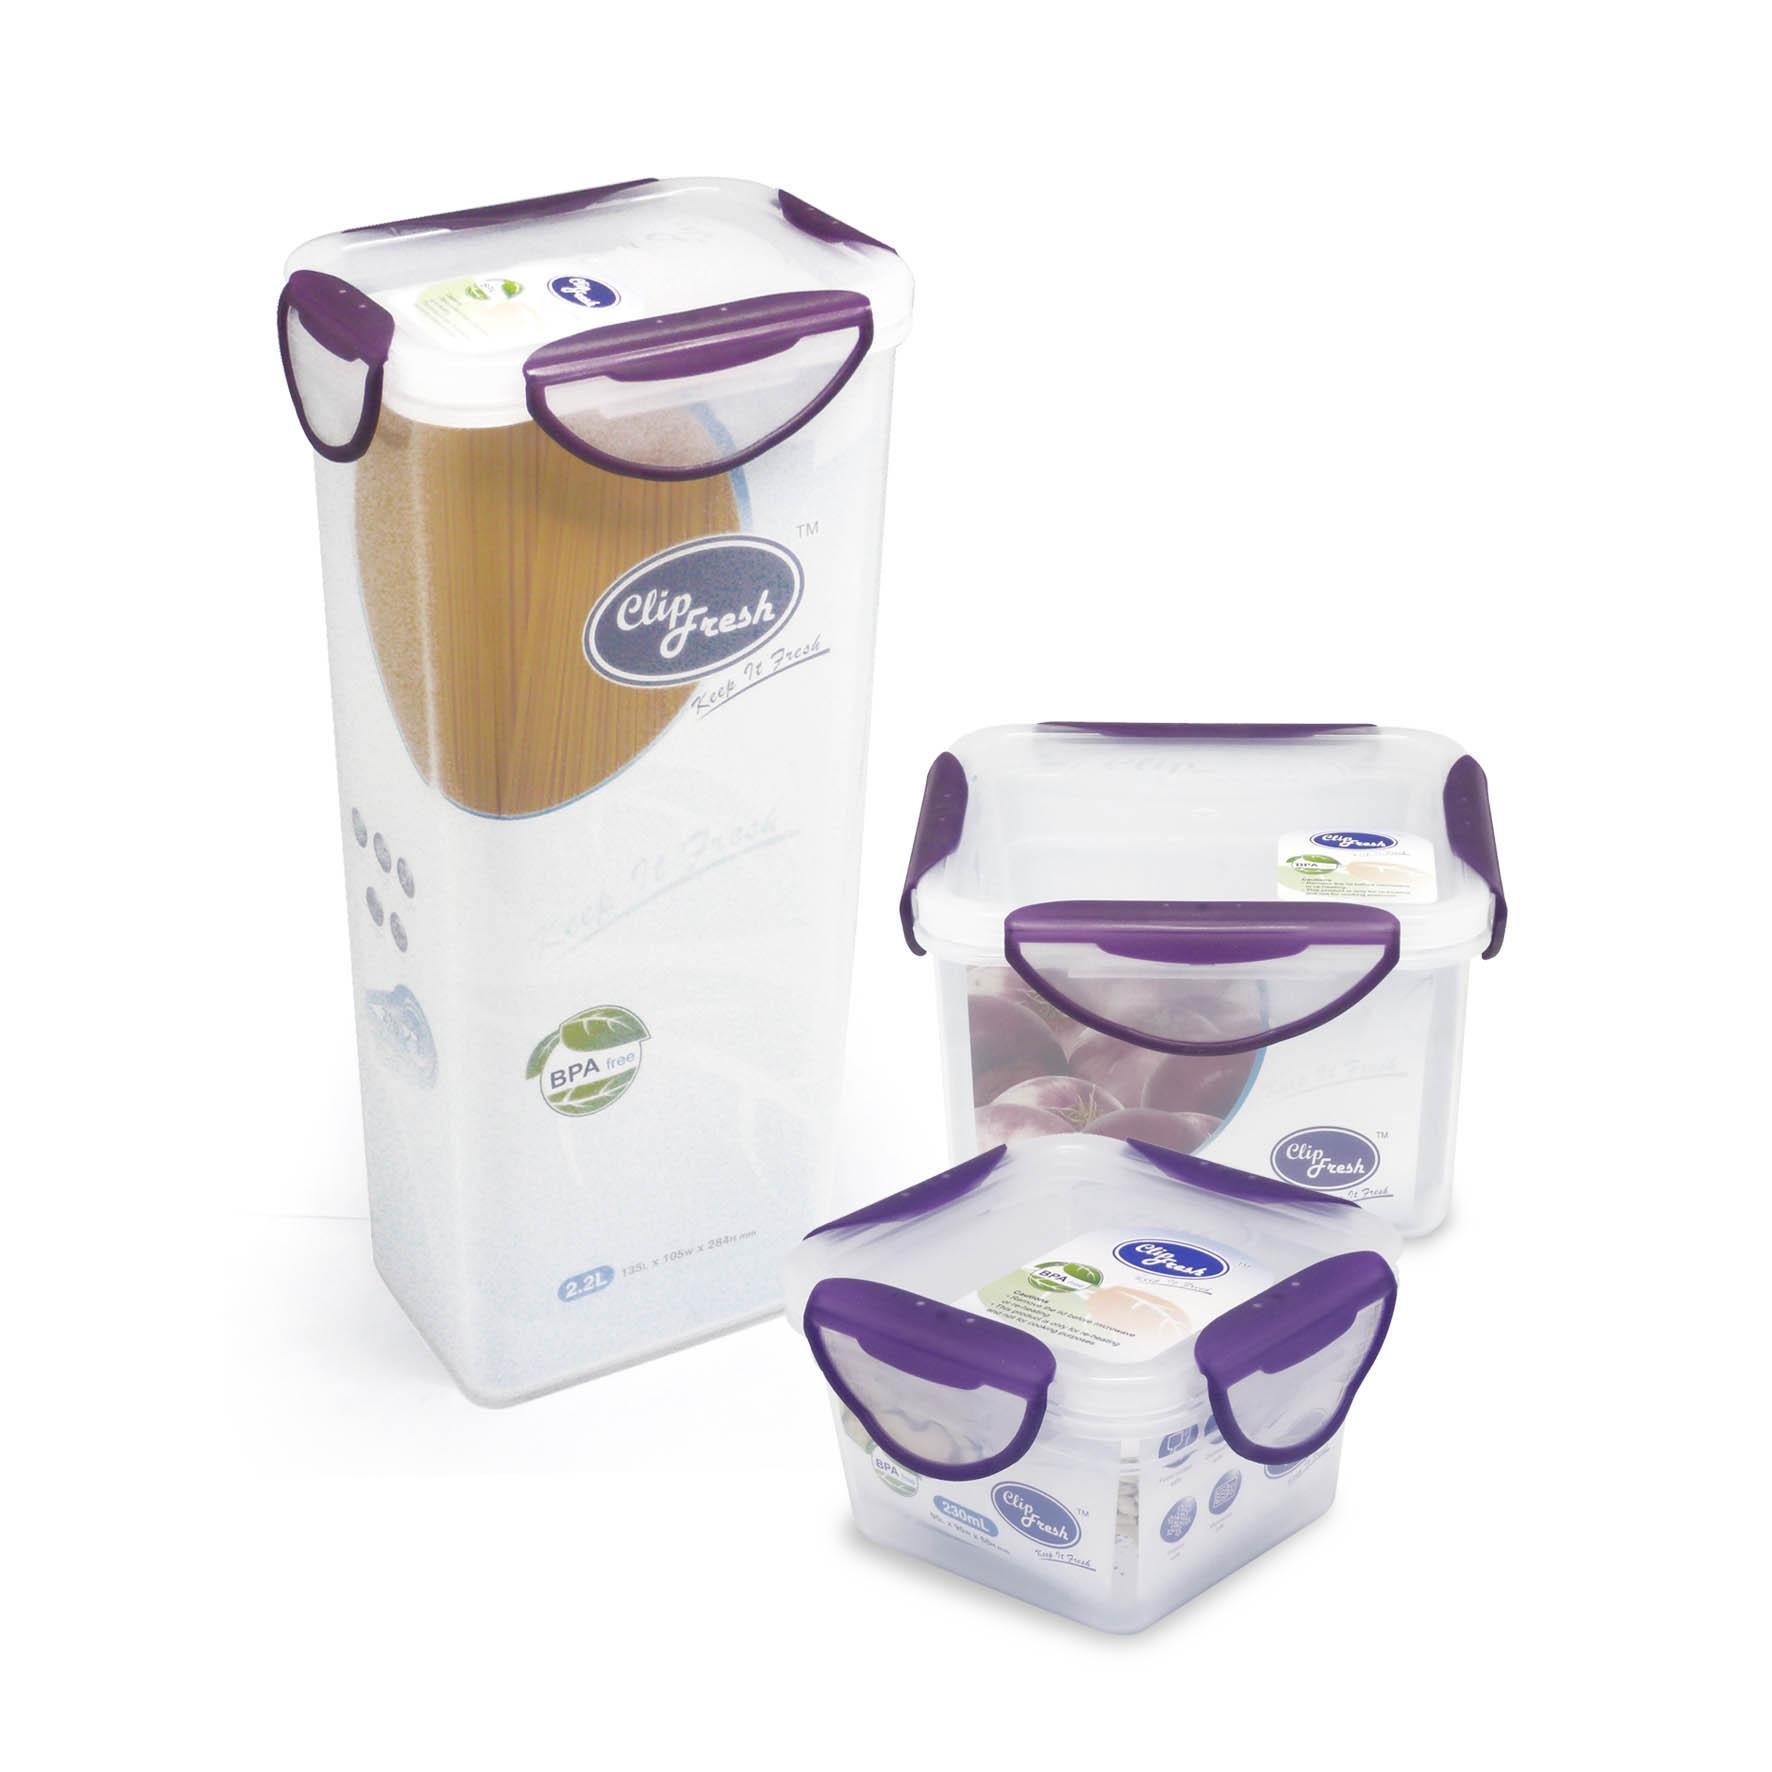 Clip Fresh Plastic Round Food Storage 0 68l Transparan Lid Violet Oxone Ox 303 Liberty Jar Tempat Kue Snack Makanan Besar 3pcs Set